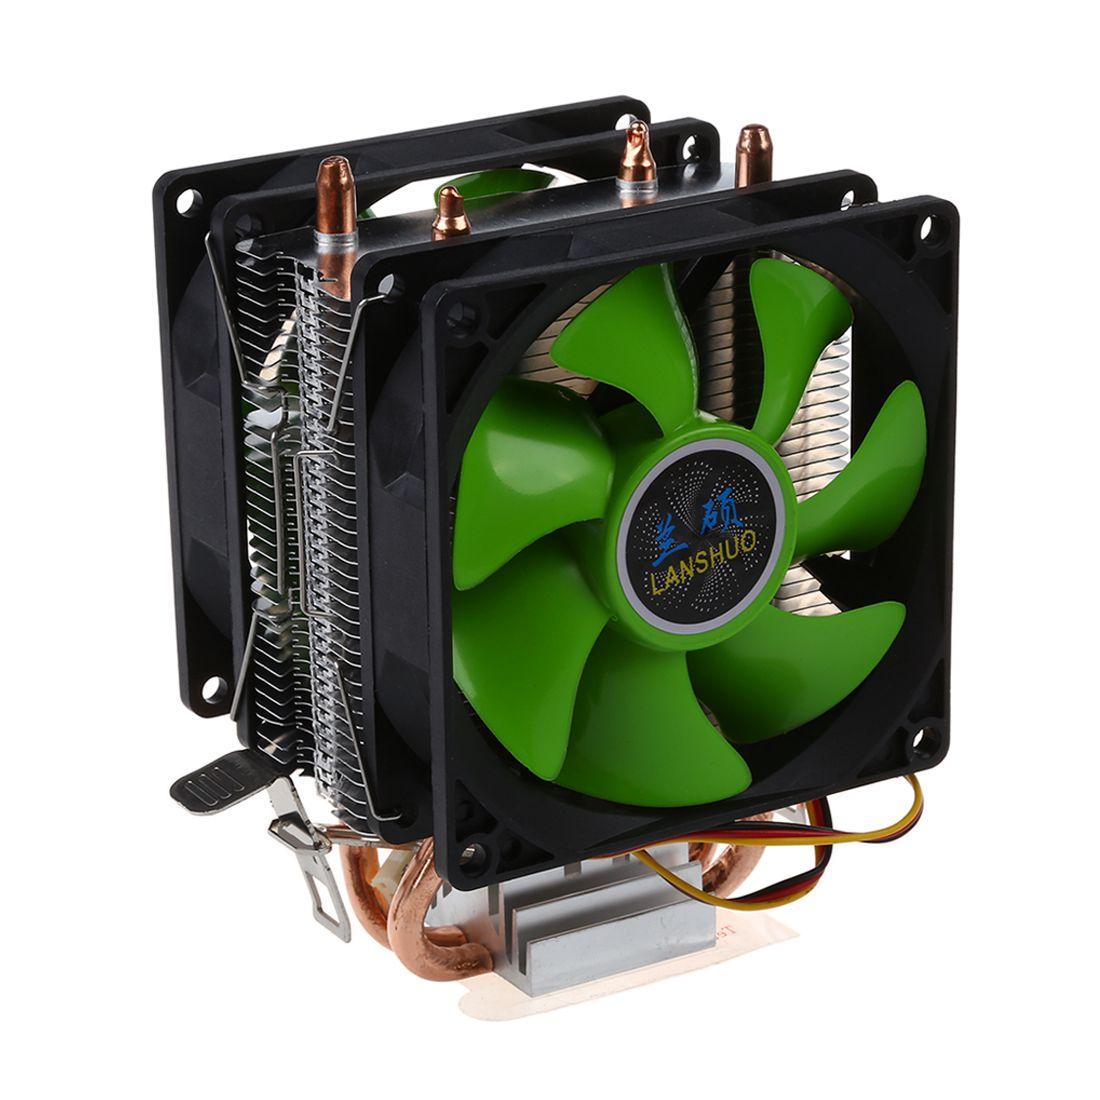 HOT-CPU refrigerador silencioso ventilador para Intel LGA775/1156/1155 AMD AM2/AM2 +/AM3